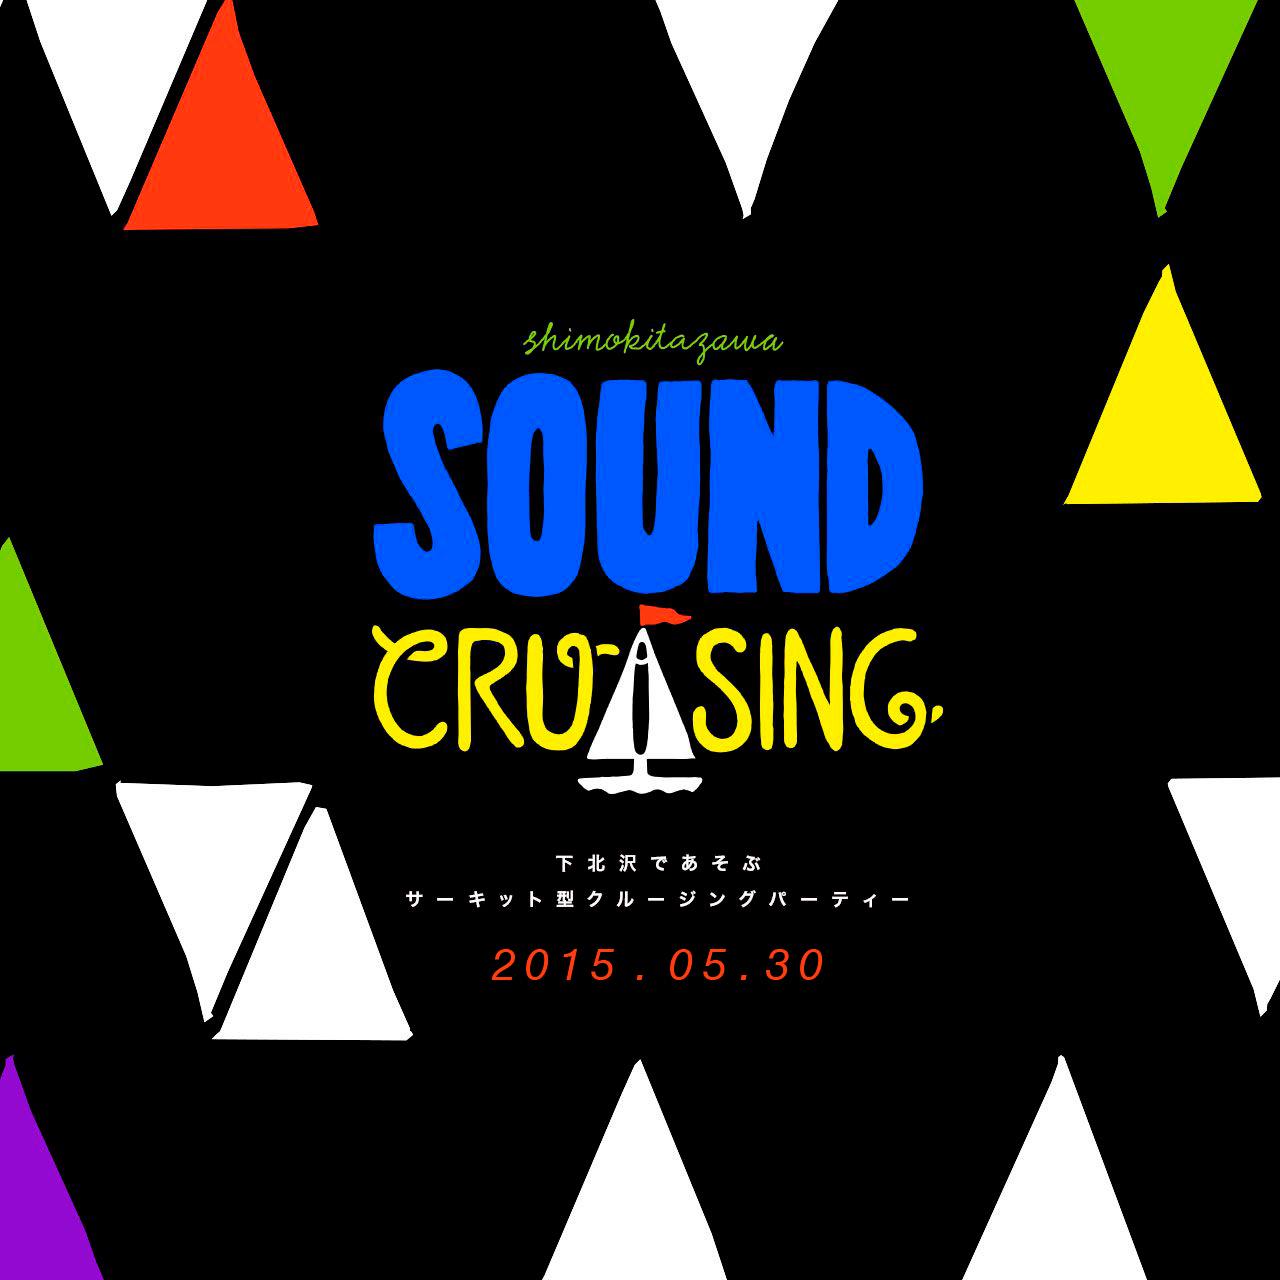 Shimokitazawa SOUND CRUISING出演者出演者第2弾発表!どついたるねん、ゆるめるモ!ら12組が追加!